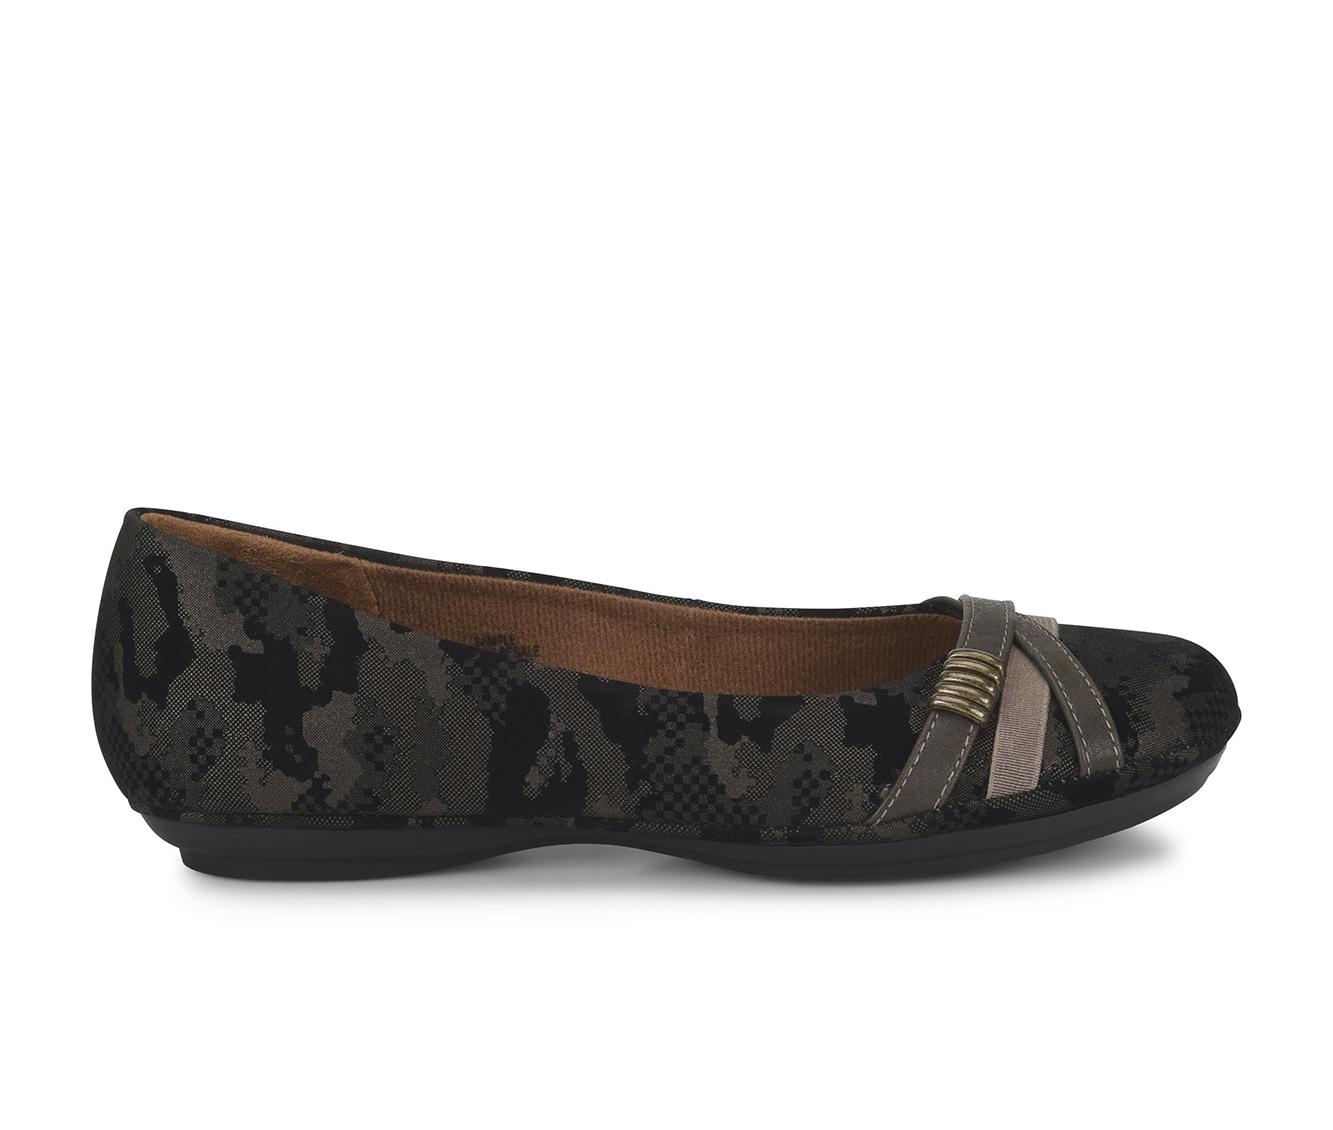 EuroSoft Shaina Women's Shoe (Green Faux Leather)